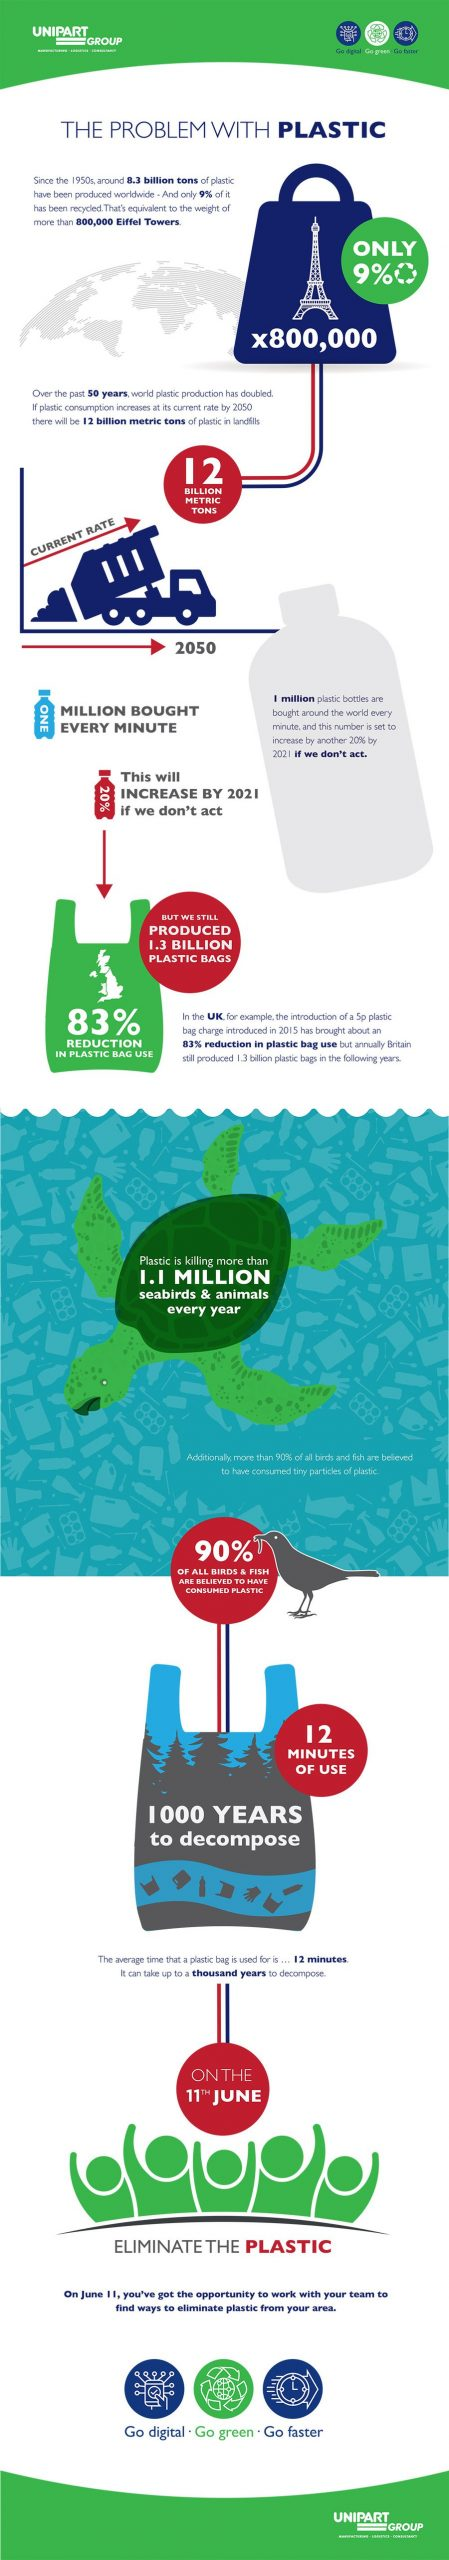 Reducing single-use plastic infographic